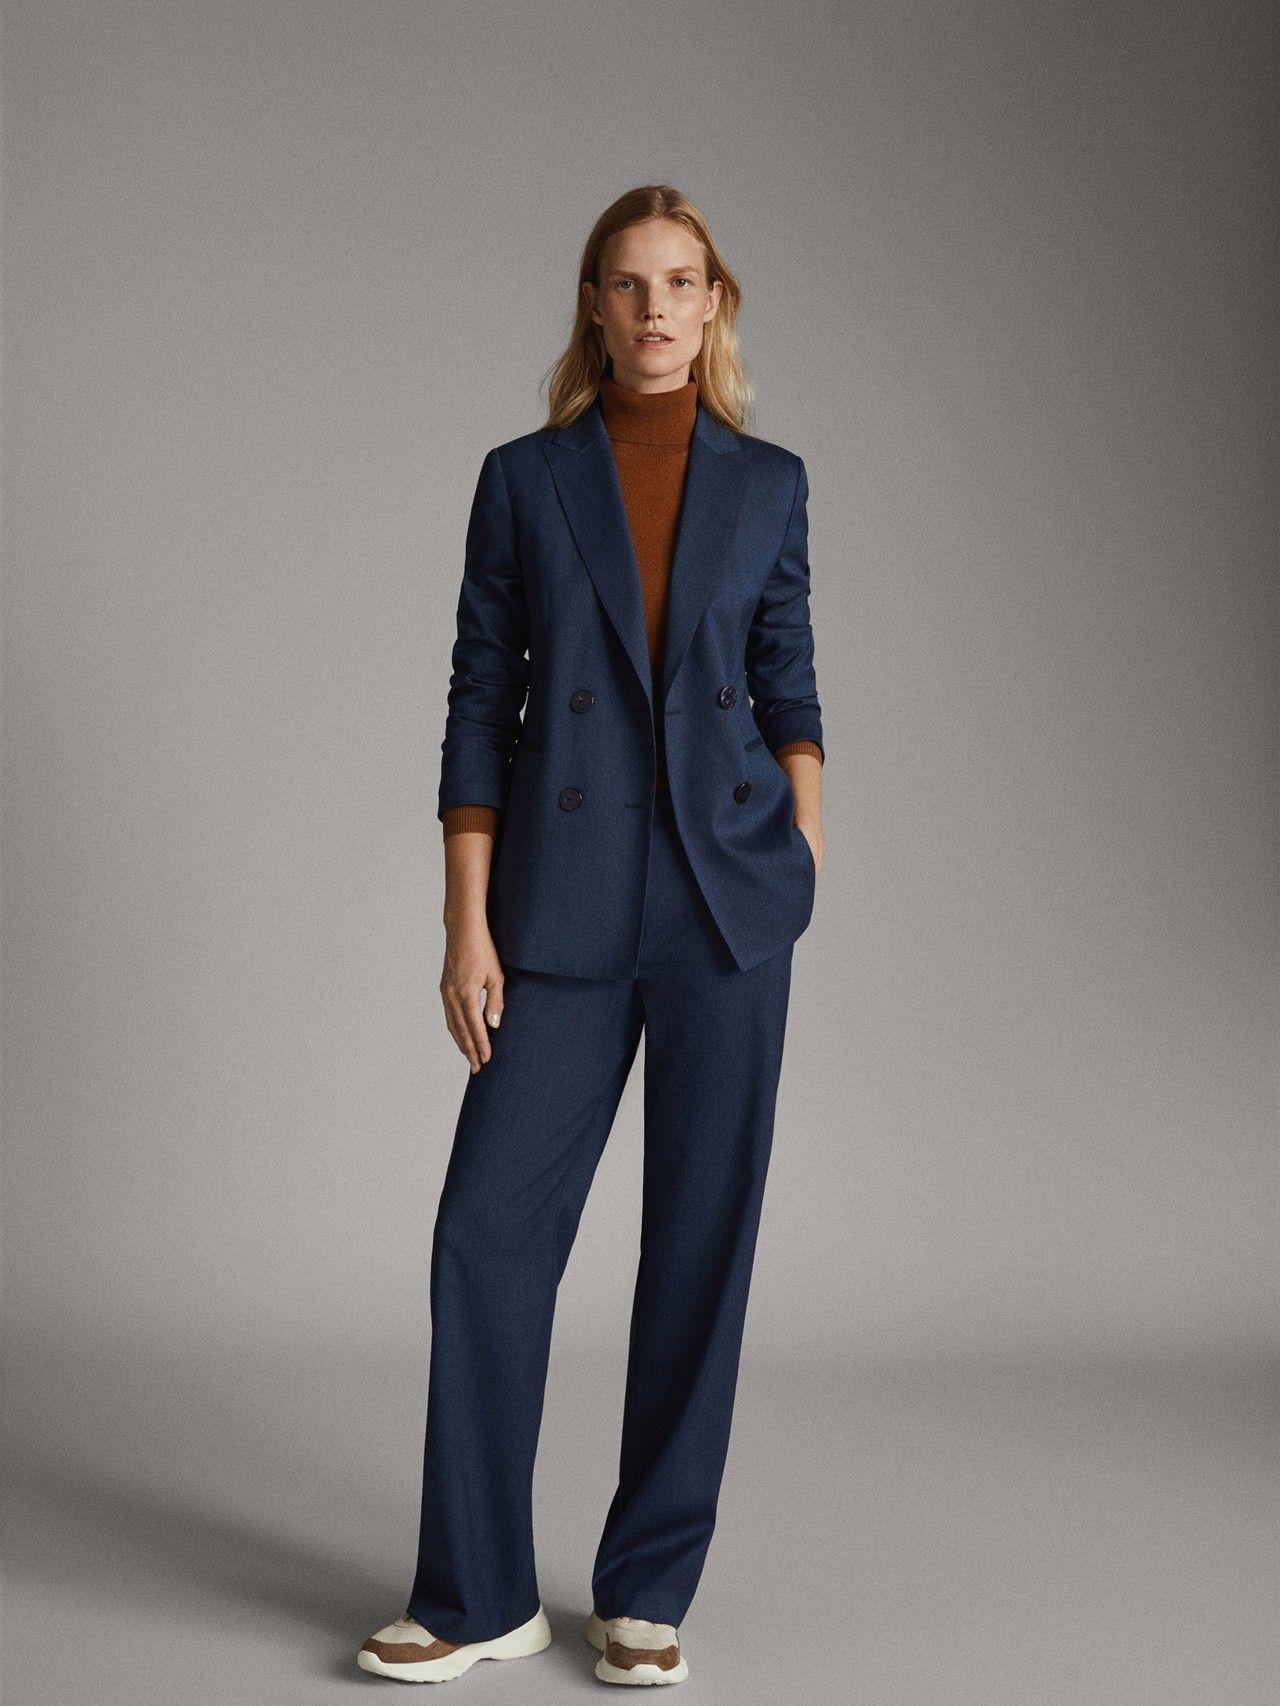 Massimo Dutti Mujer Americana Denim Lana Marino Azul Marino 38 Pantalon Azul Marino Mujer Moda Traje Sastre